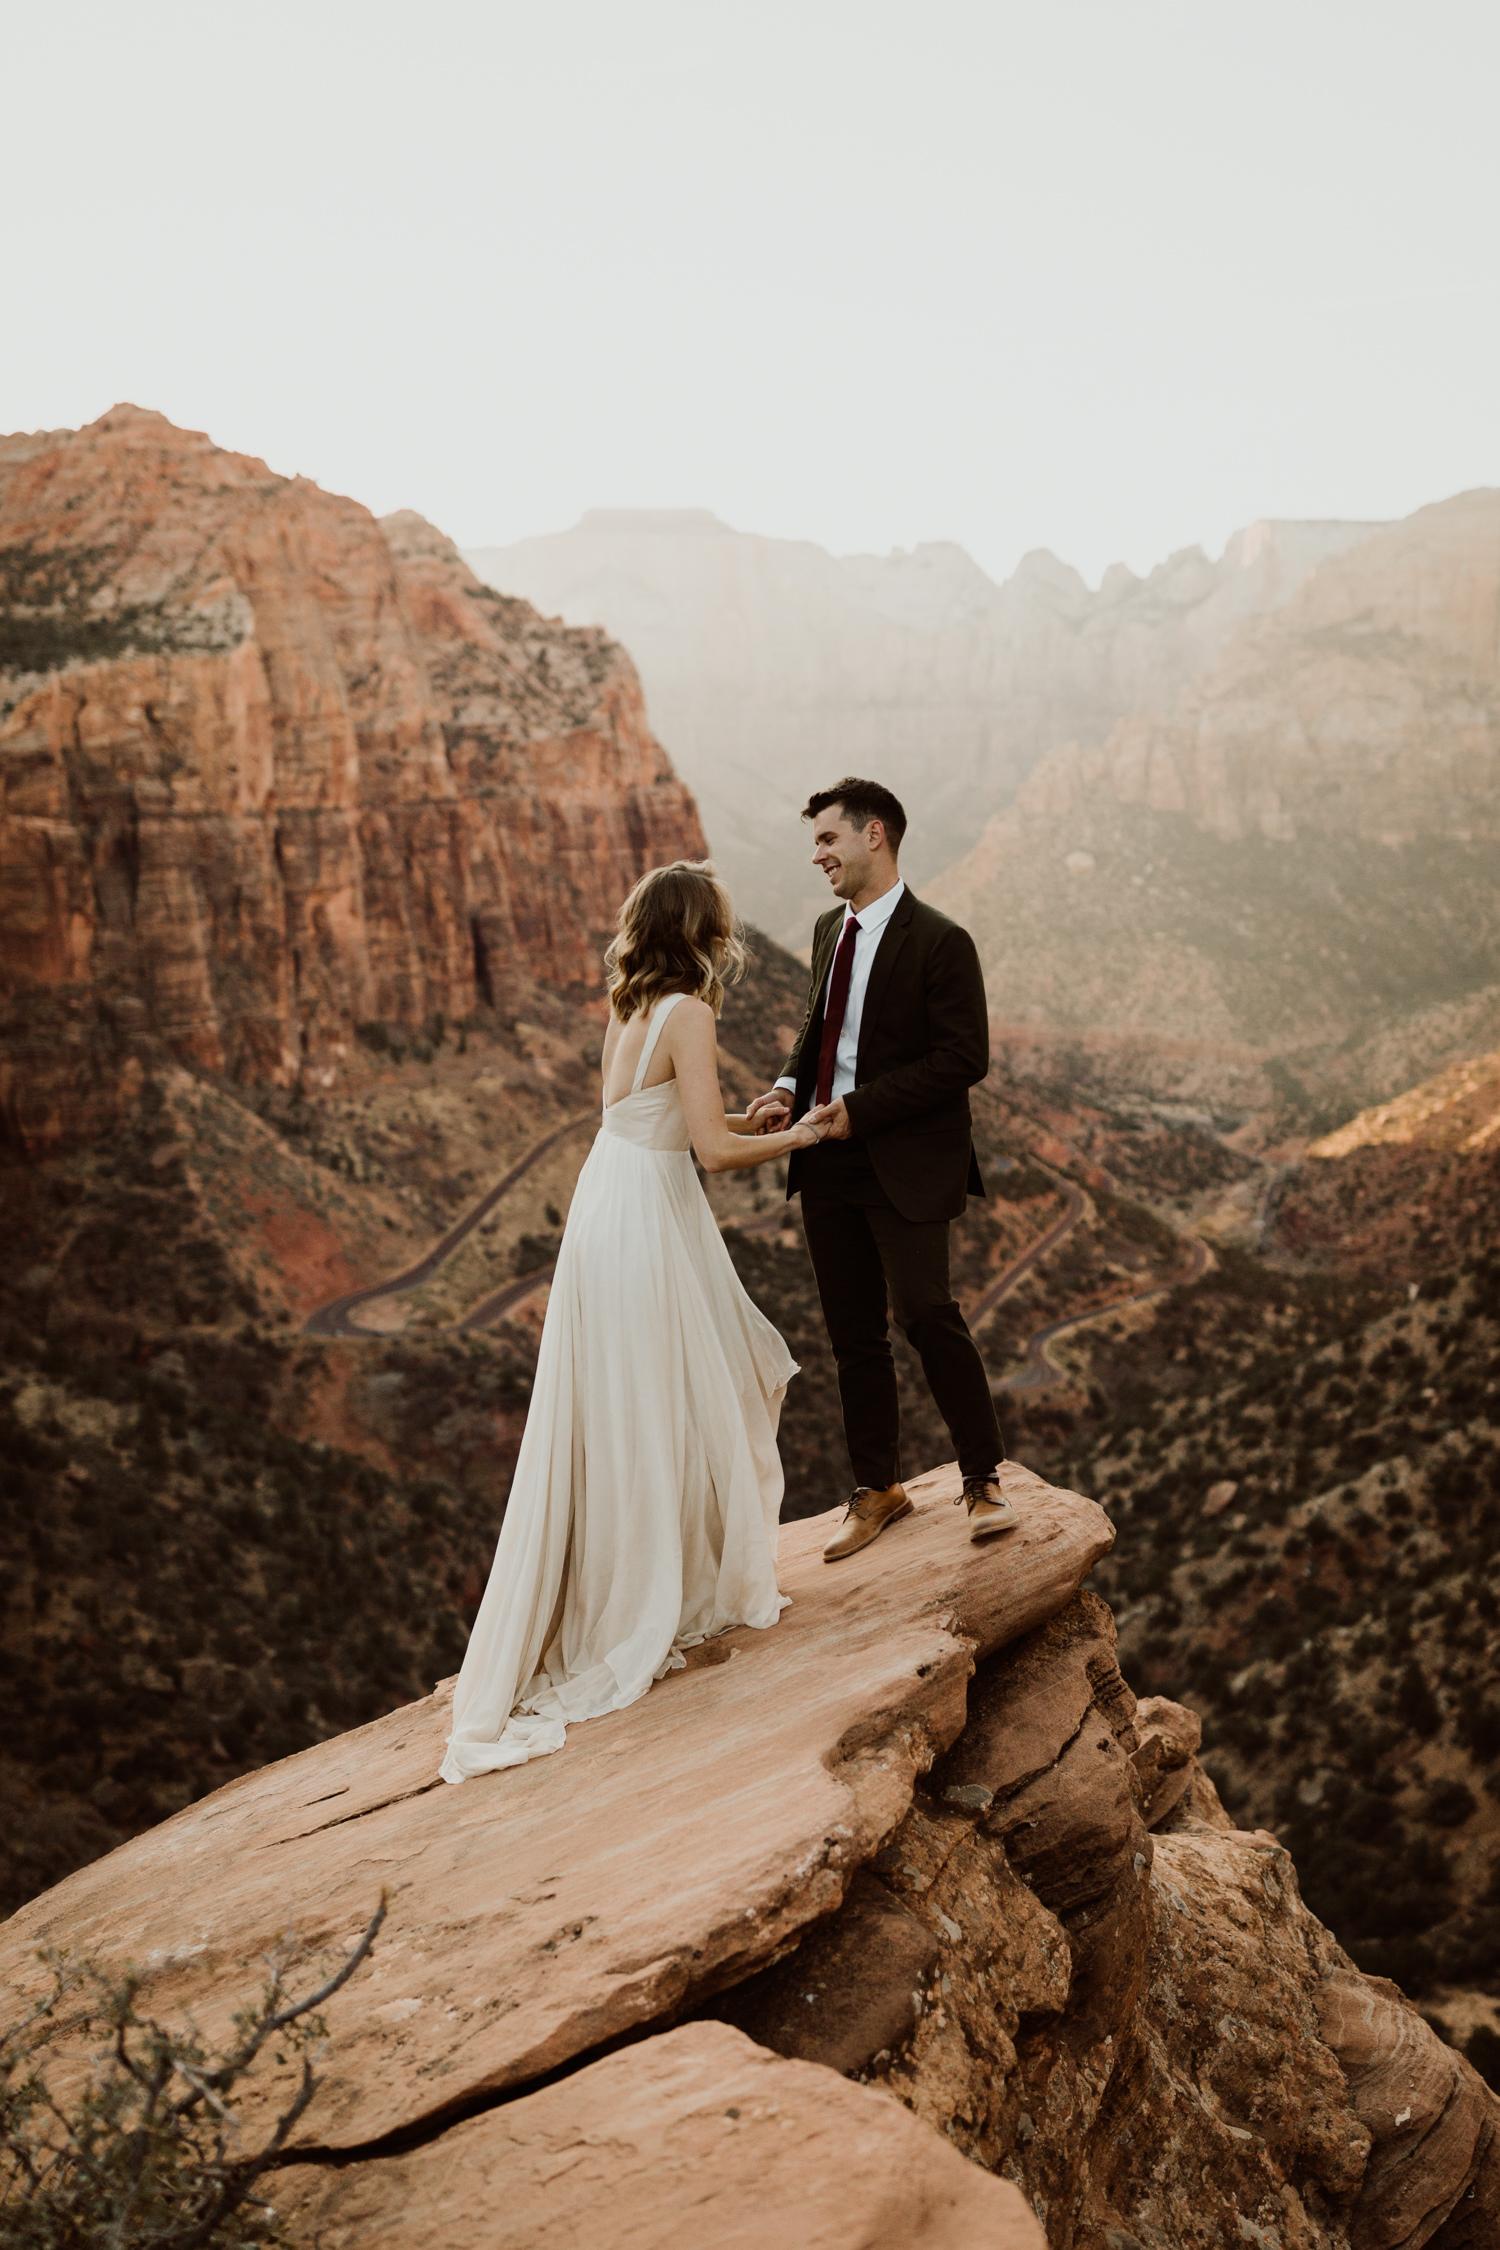 zion-national-park-wedding-113.jpg